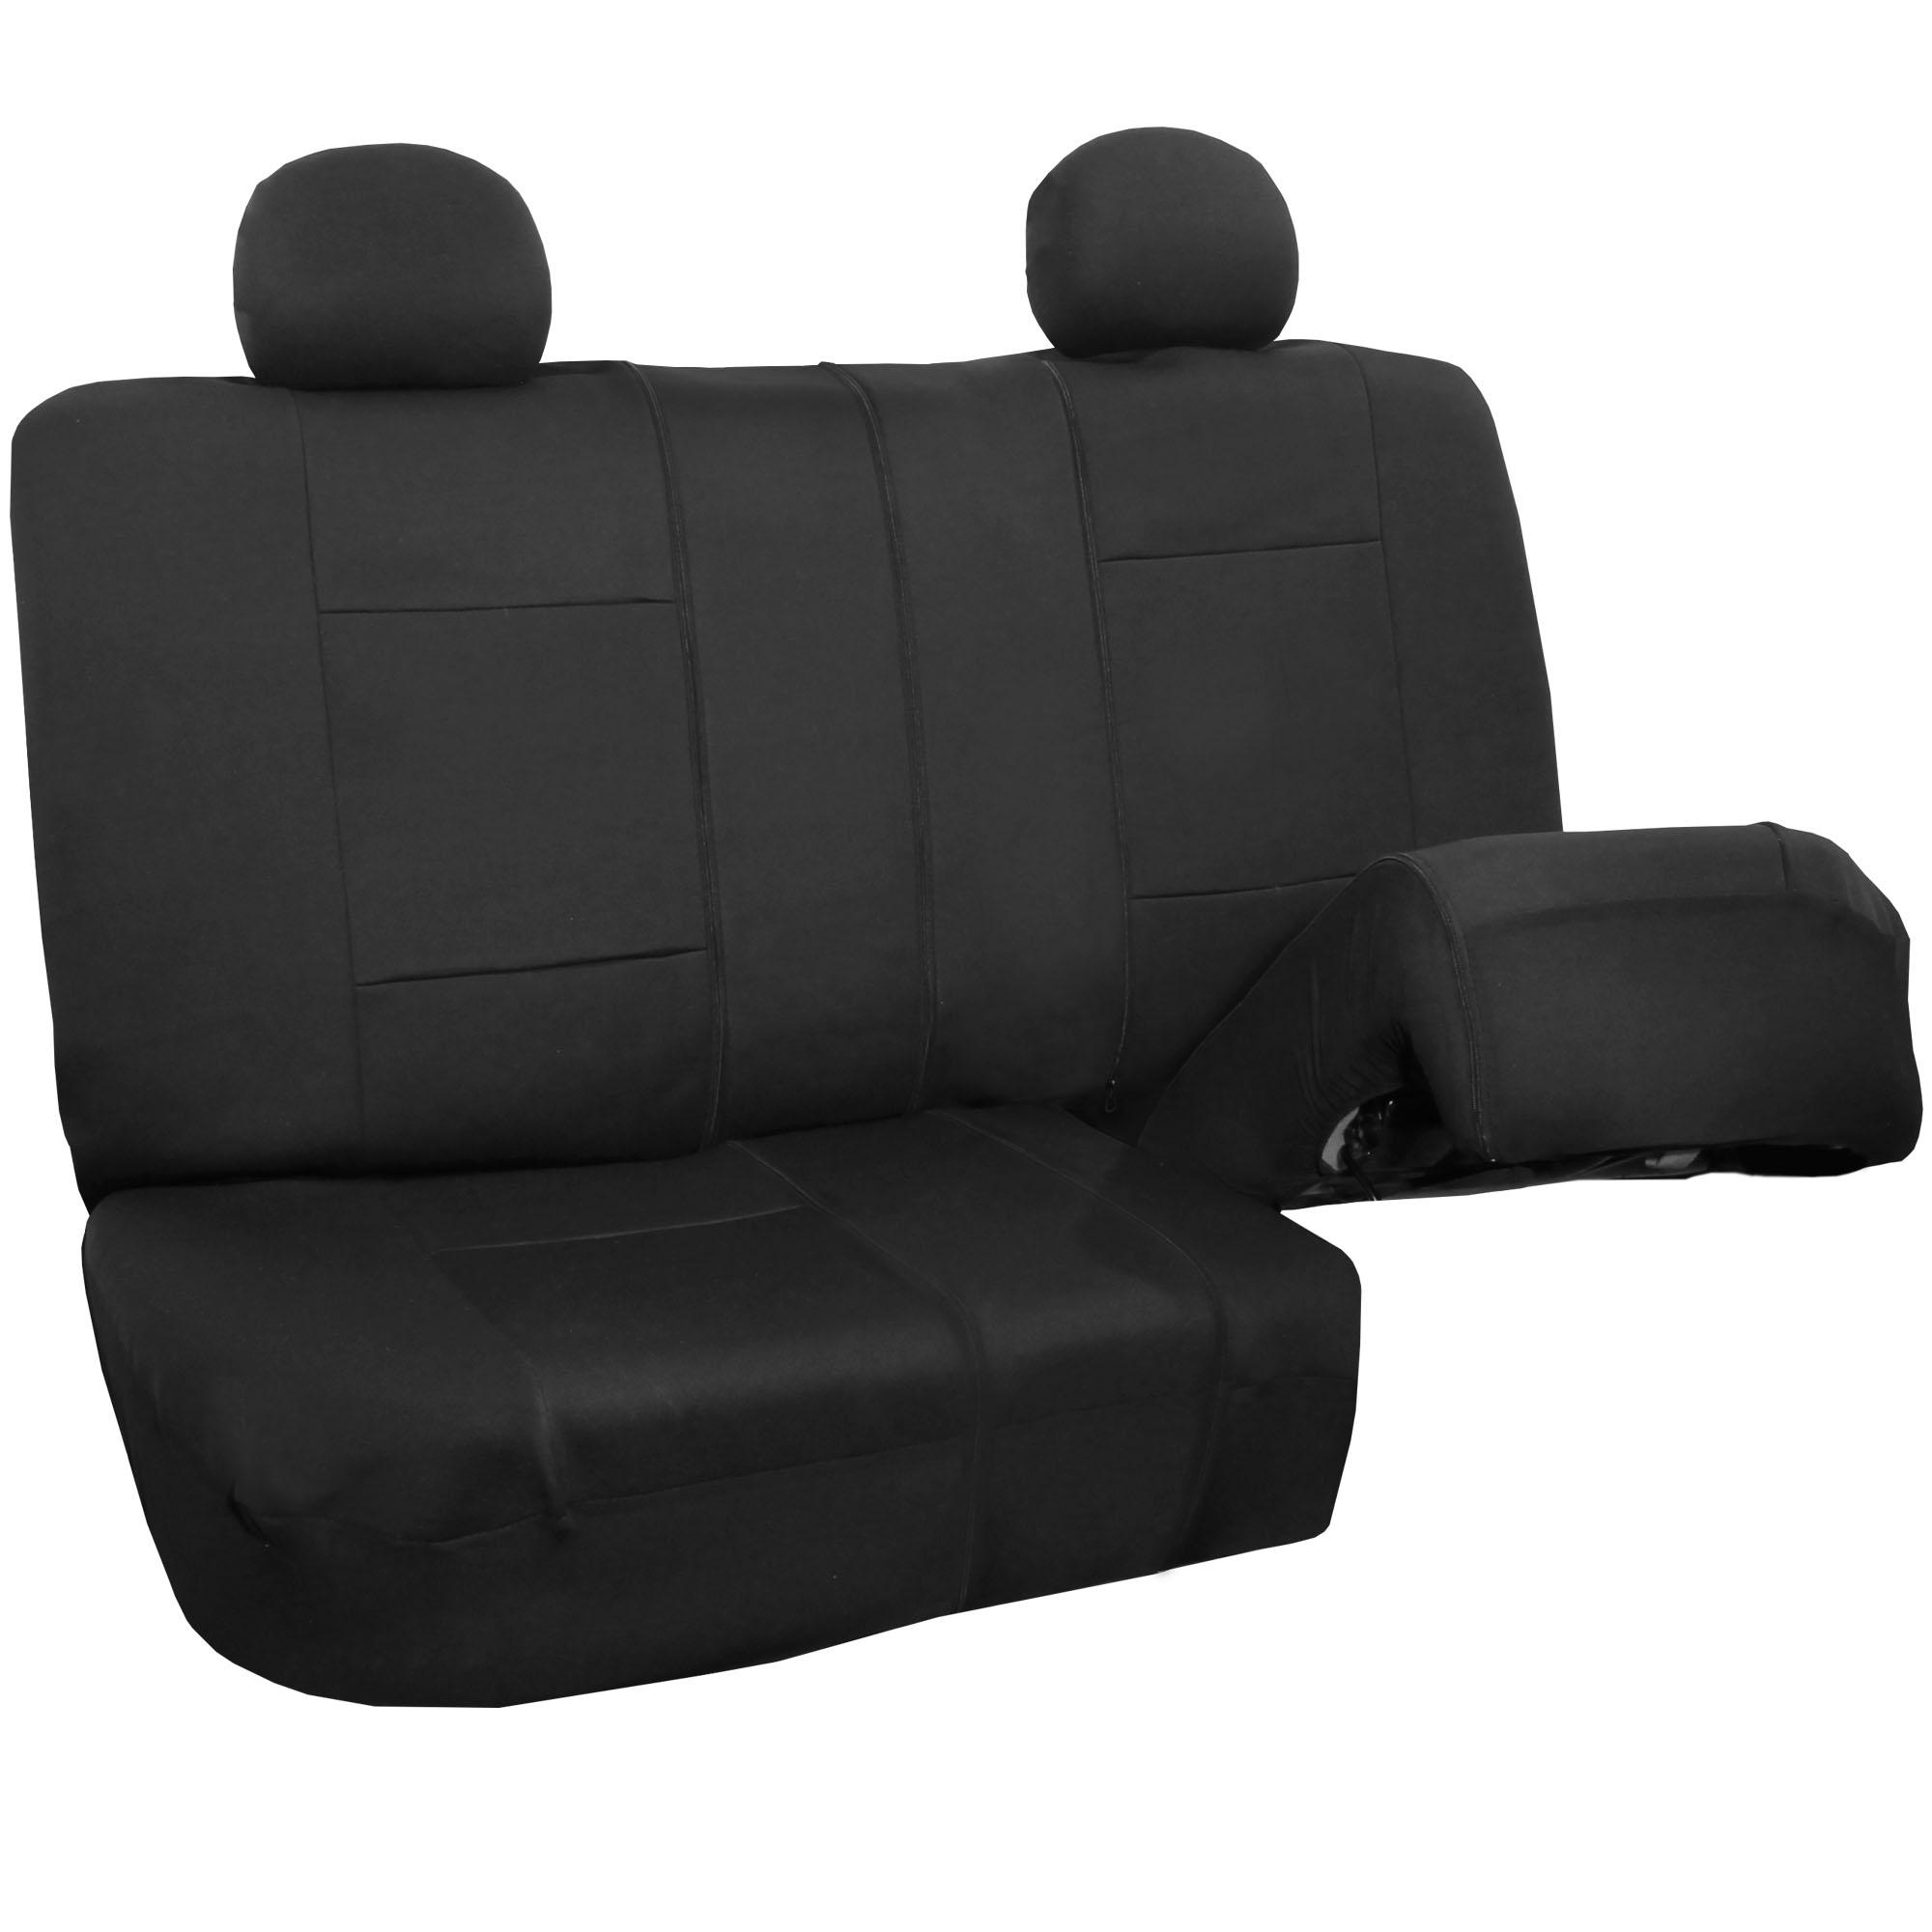 Car Seat Cover Neoprene Waterproof Pet Proof Full Set 4